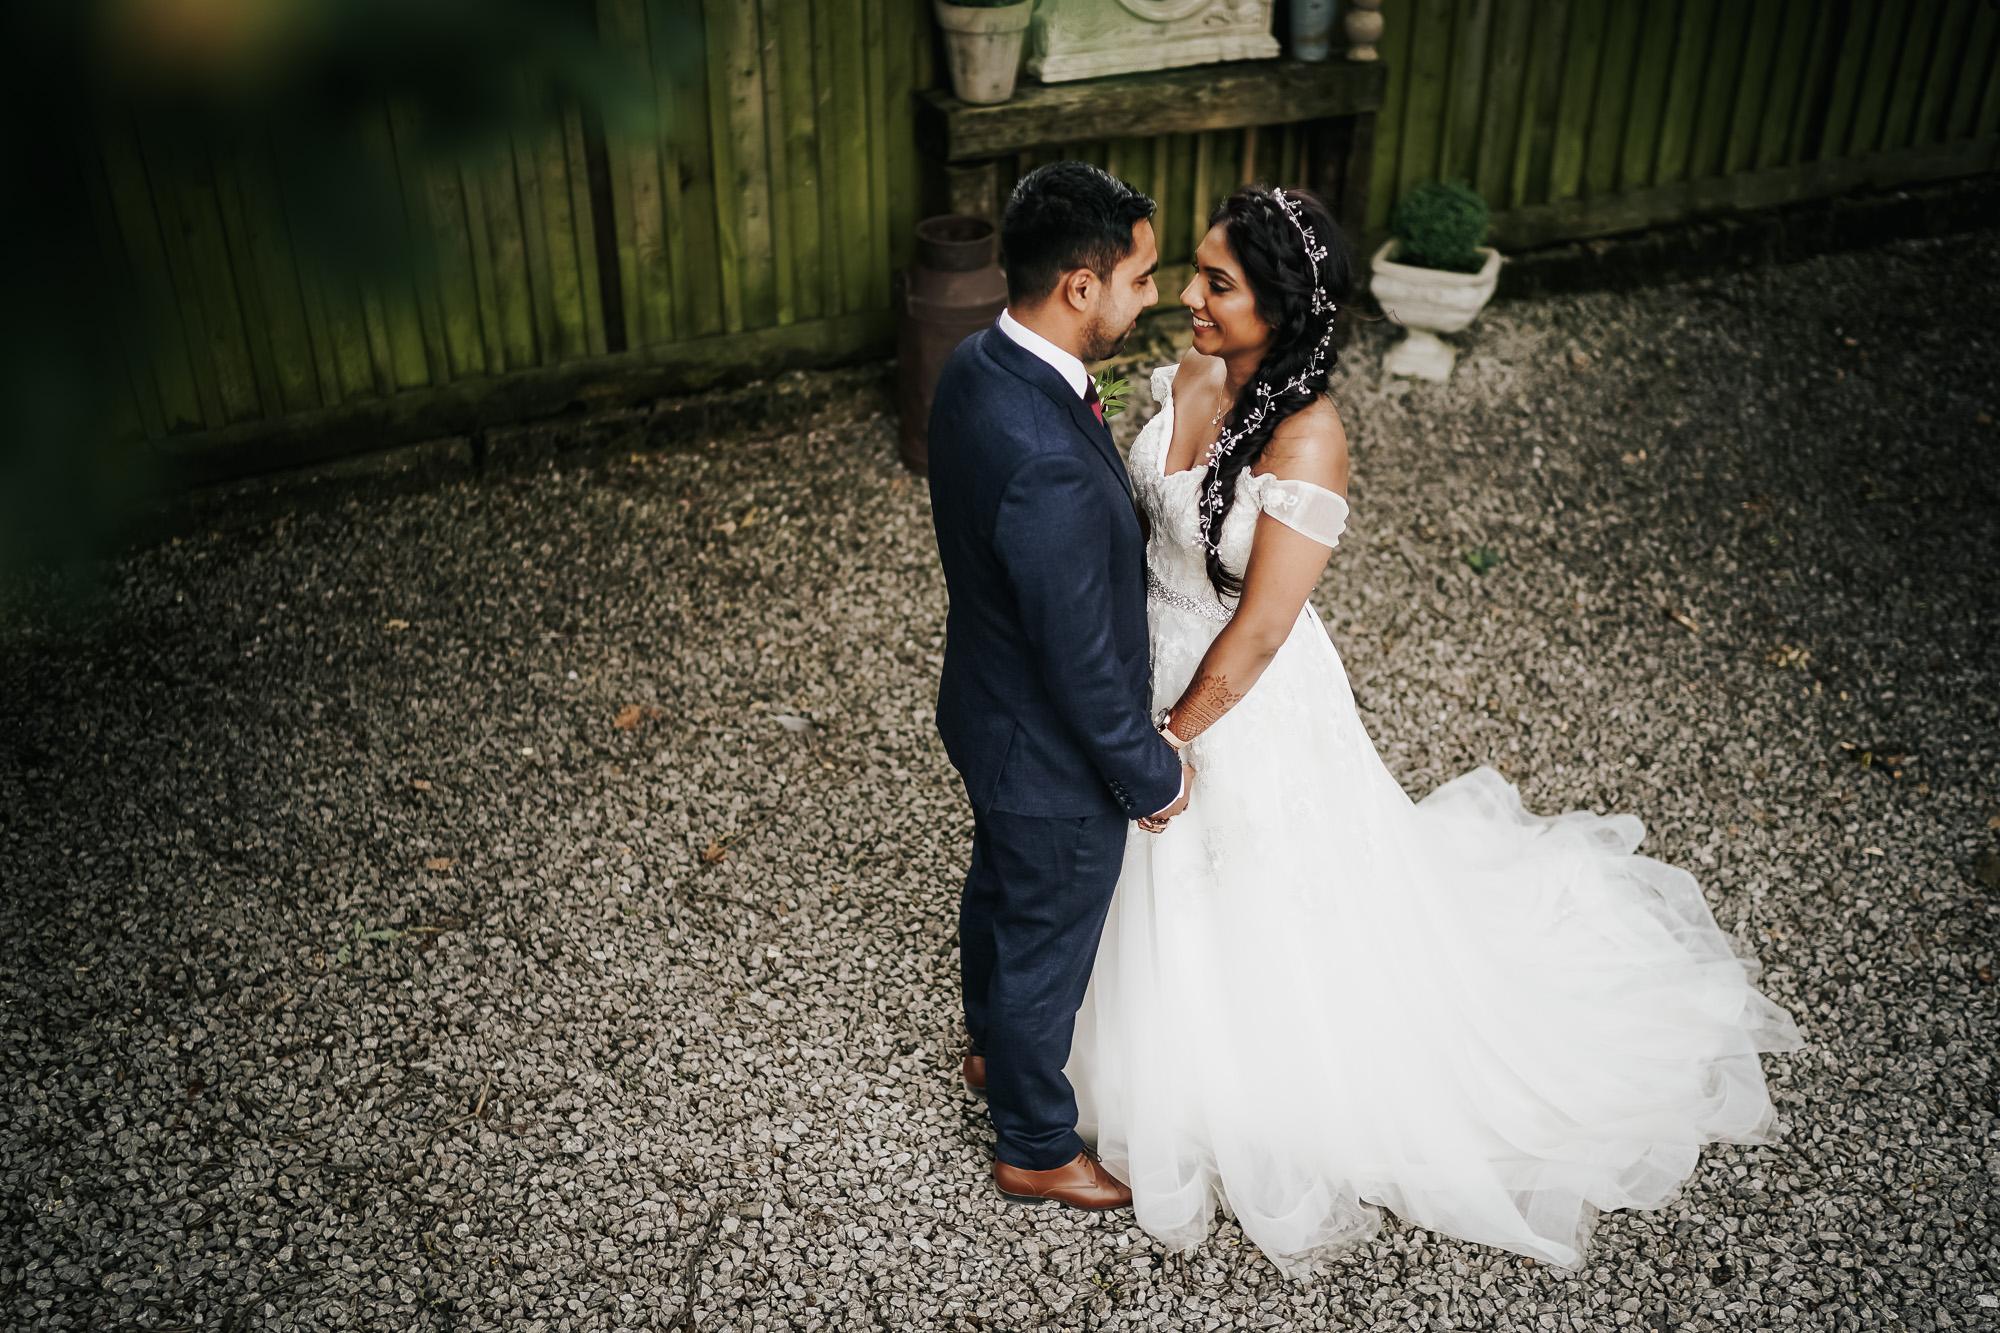 Alcumlow Hall Farm Indian Wedding Photographer (35 of 44).jpg